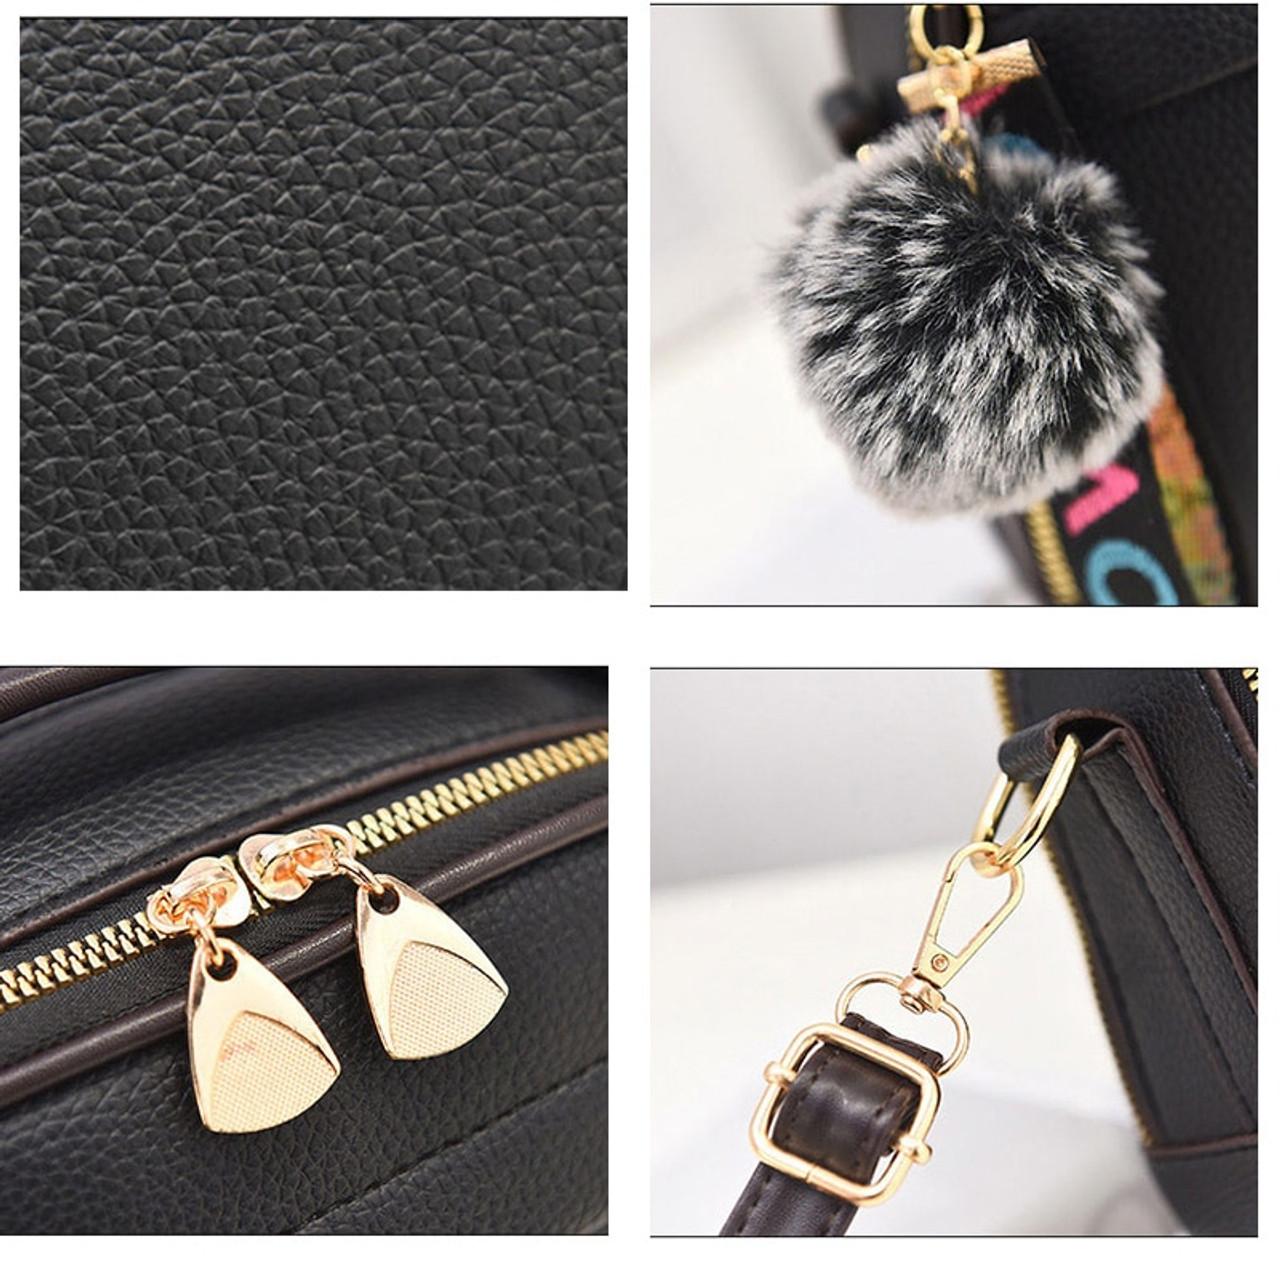 ... New Crossbody Bags For Women 2018 Handbag Shoulder Bag Female Leather  Flap Cheap Women Messenger Bags ... 918f8bdcc8882